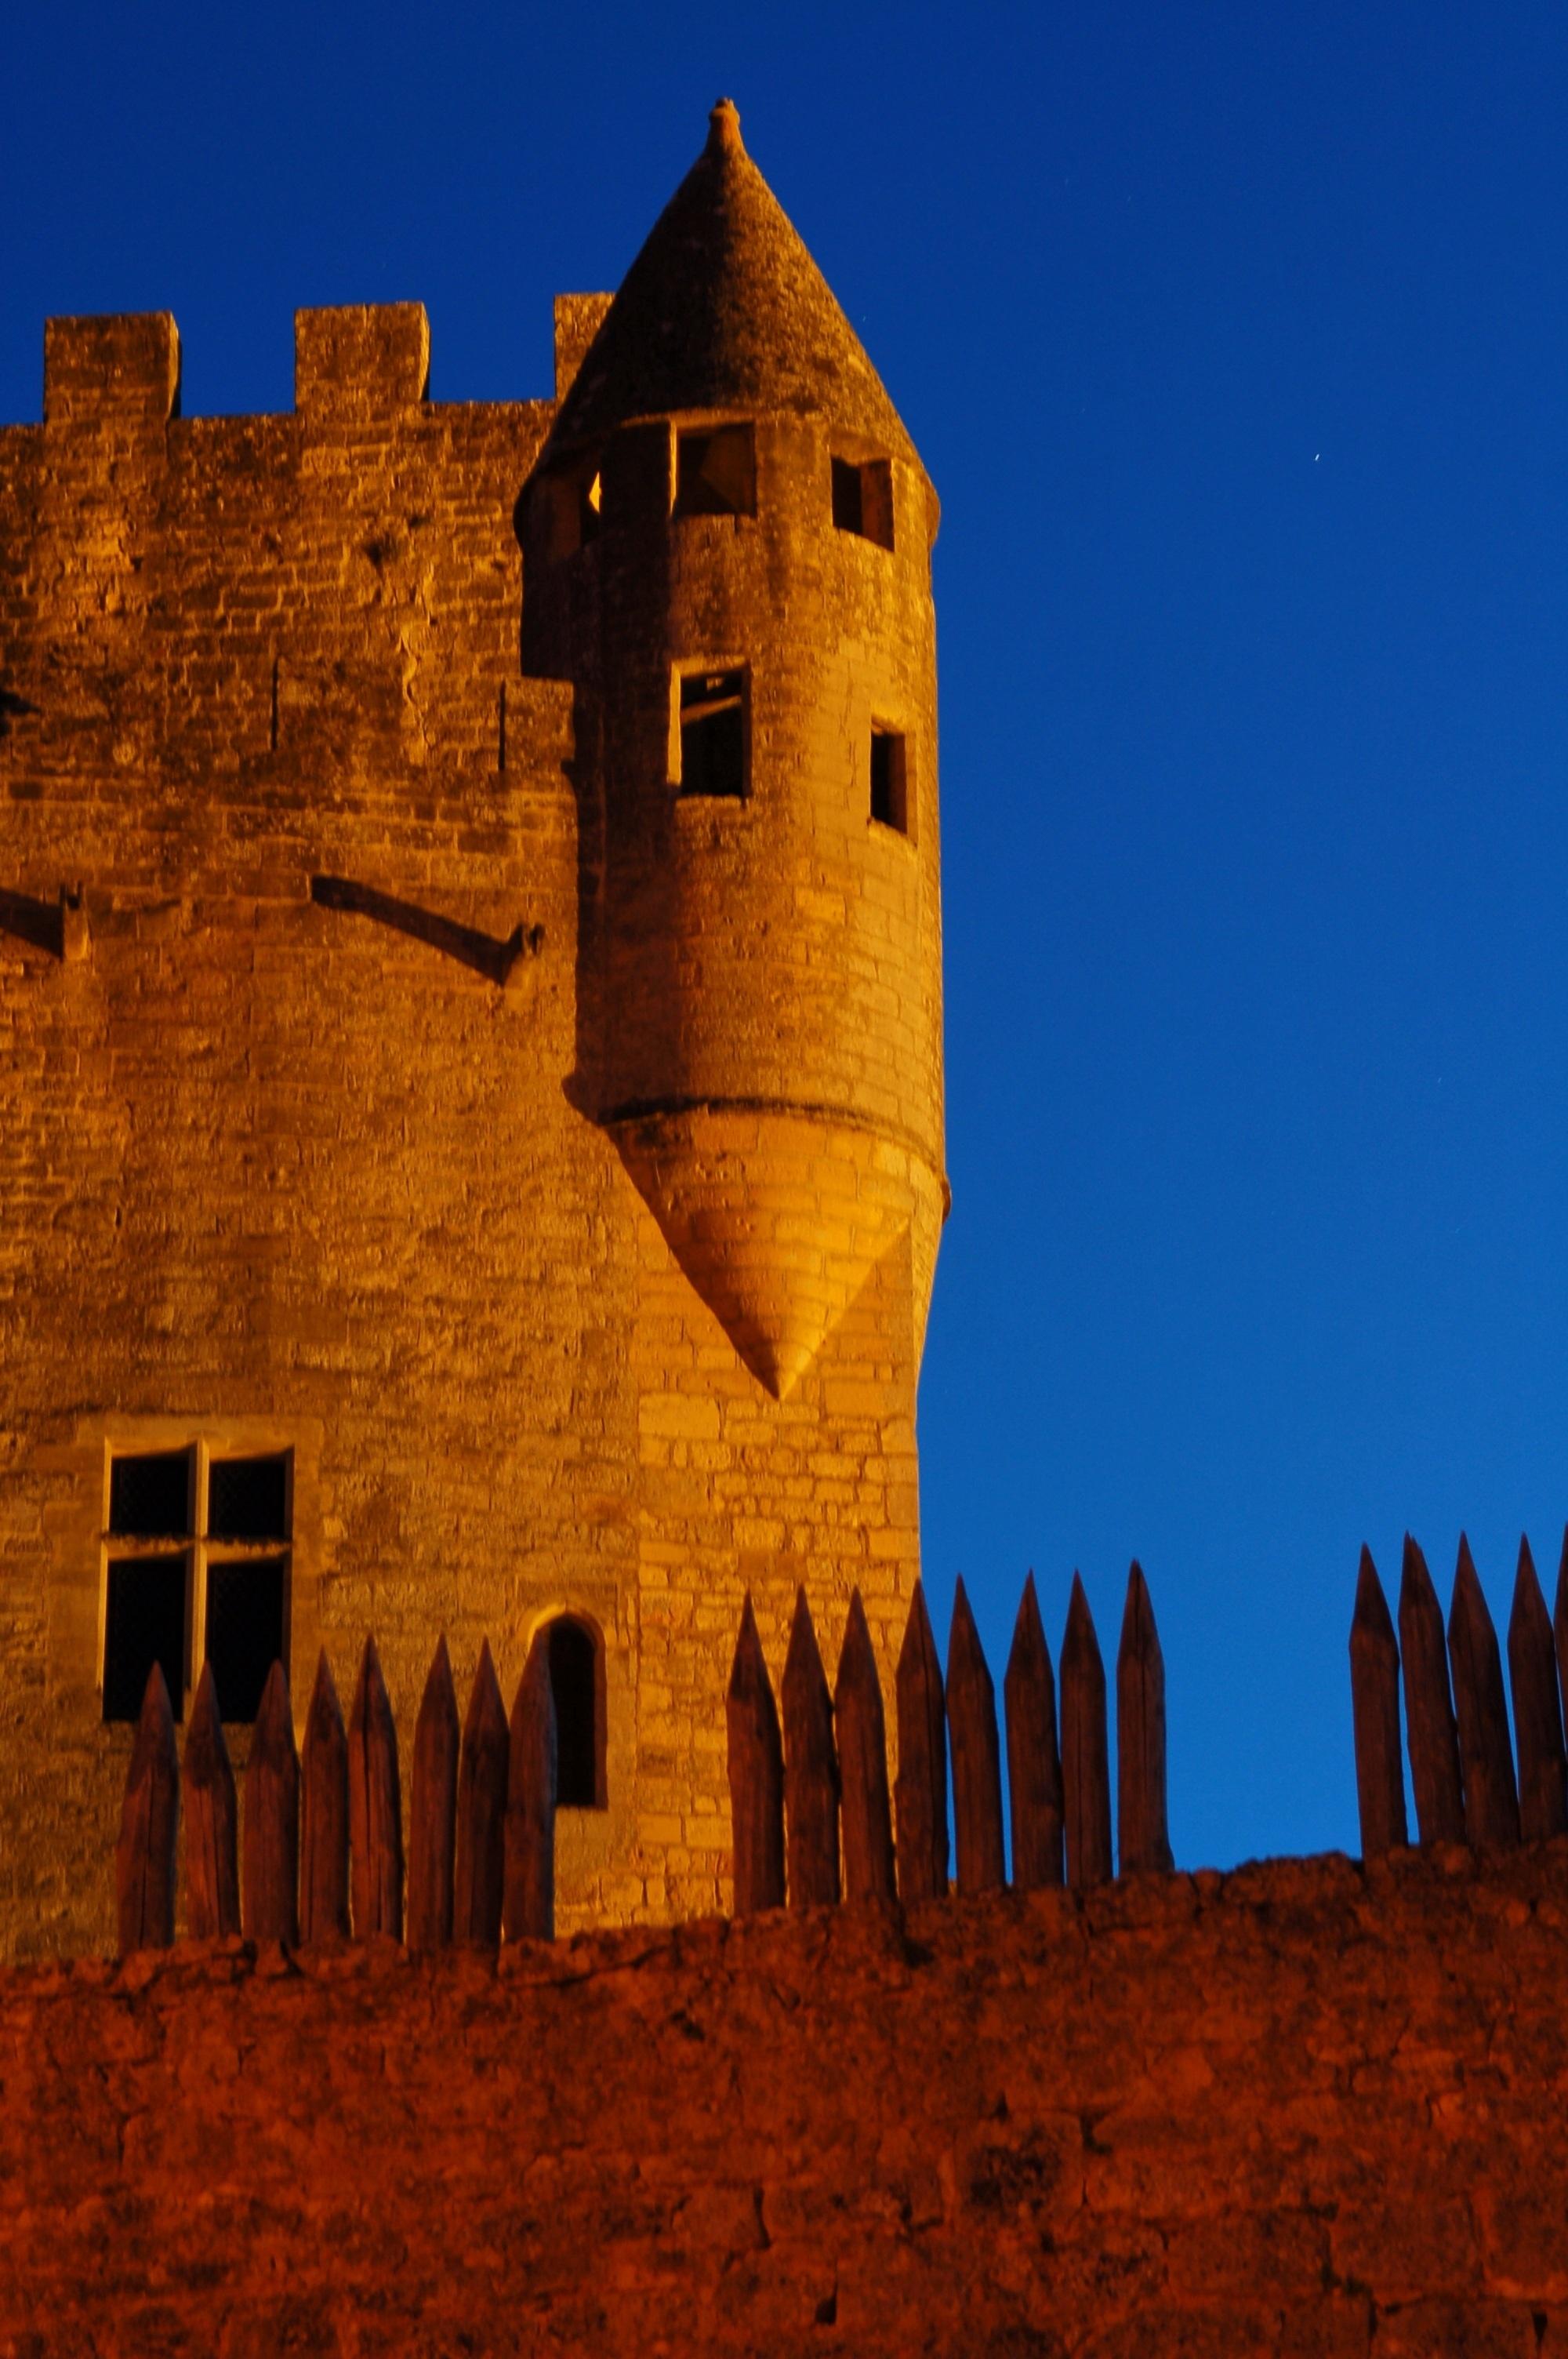 Chateau de beynac photo